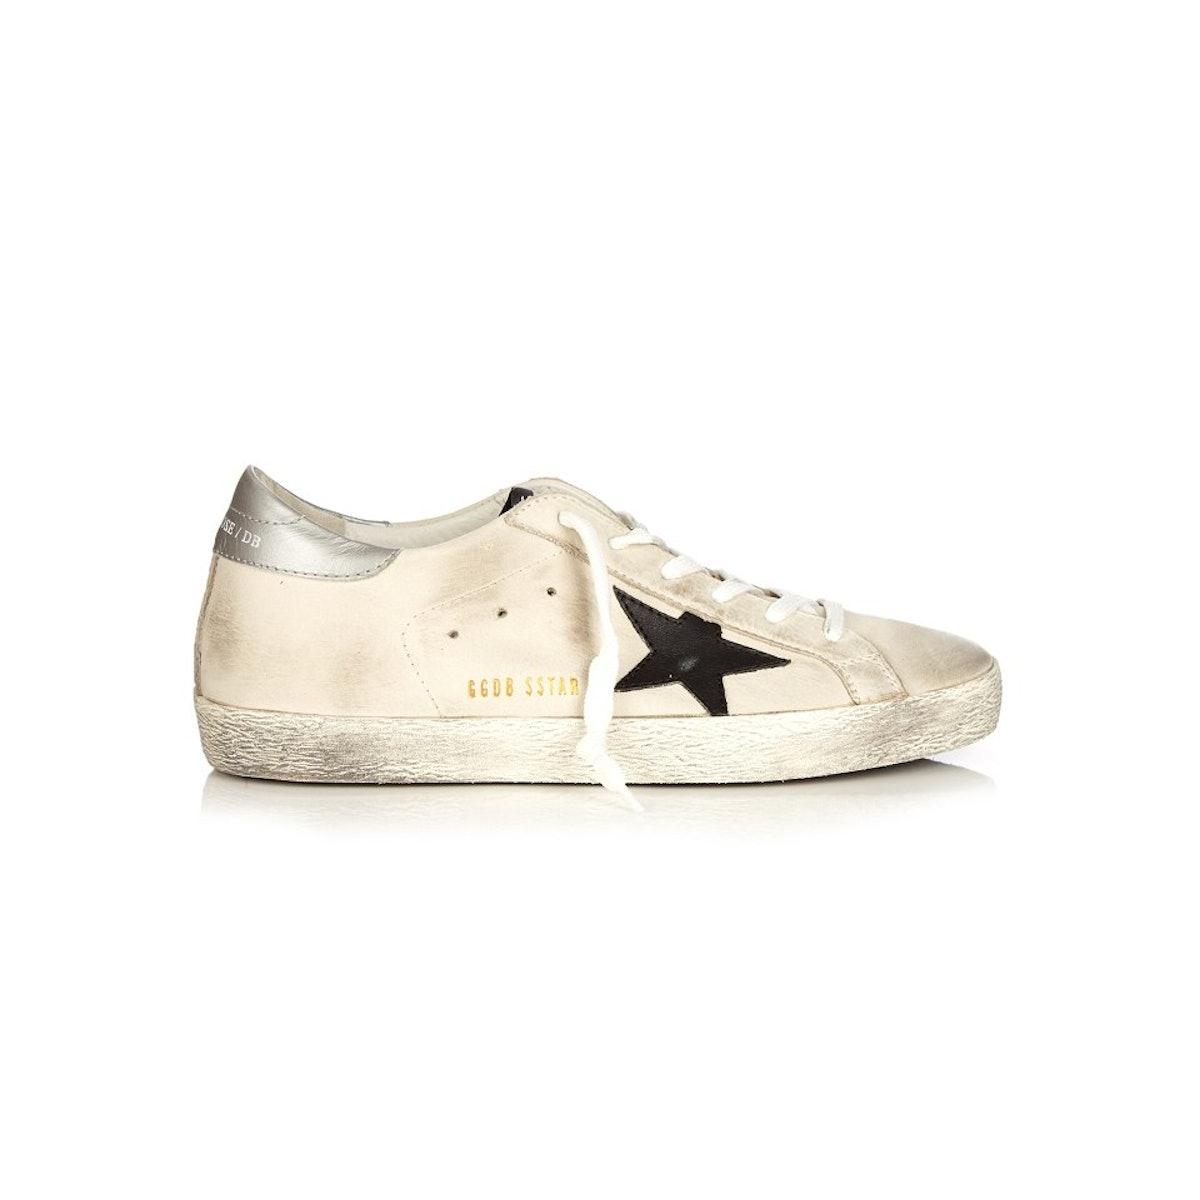 golden goose brand shoes.jpg